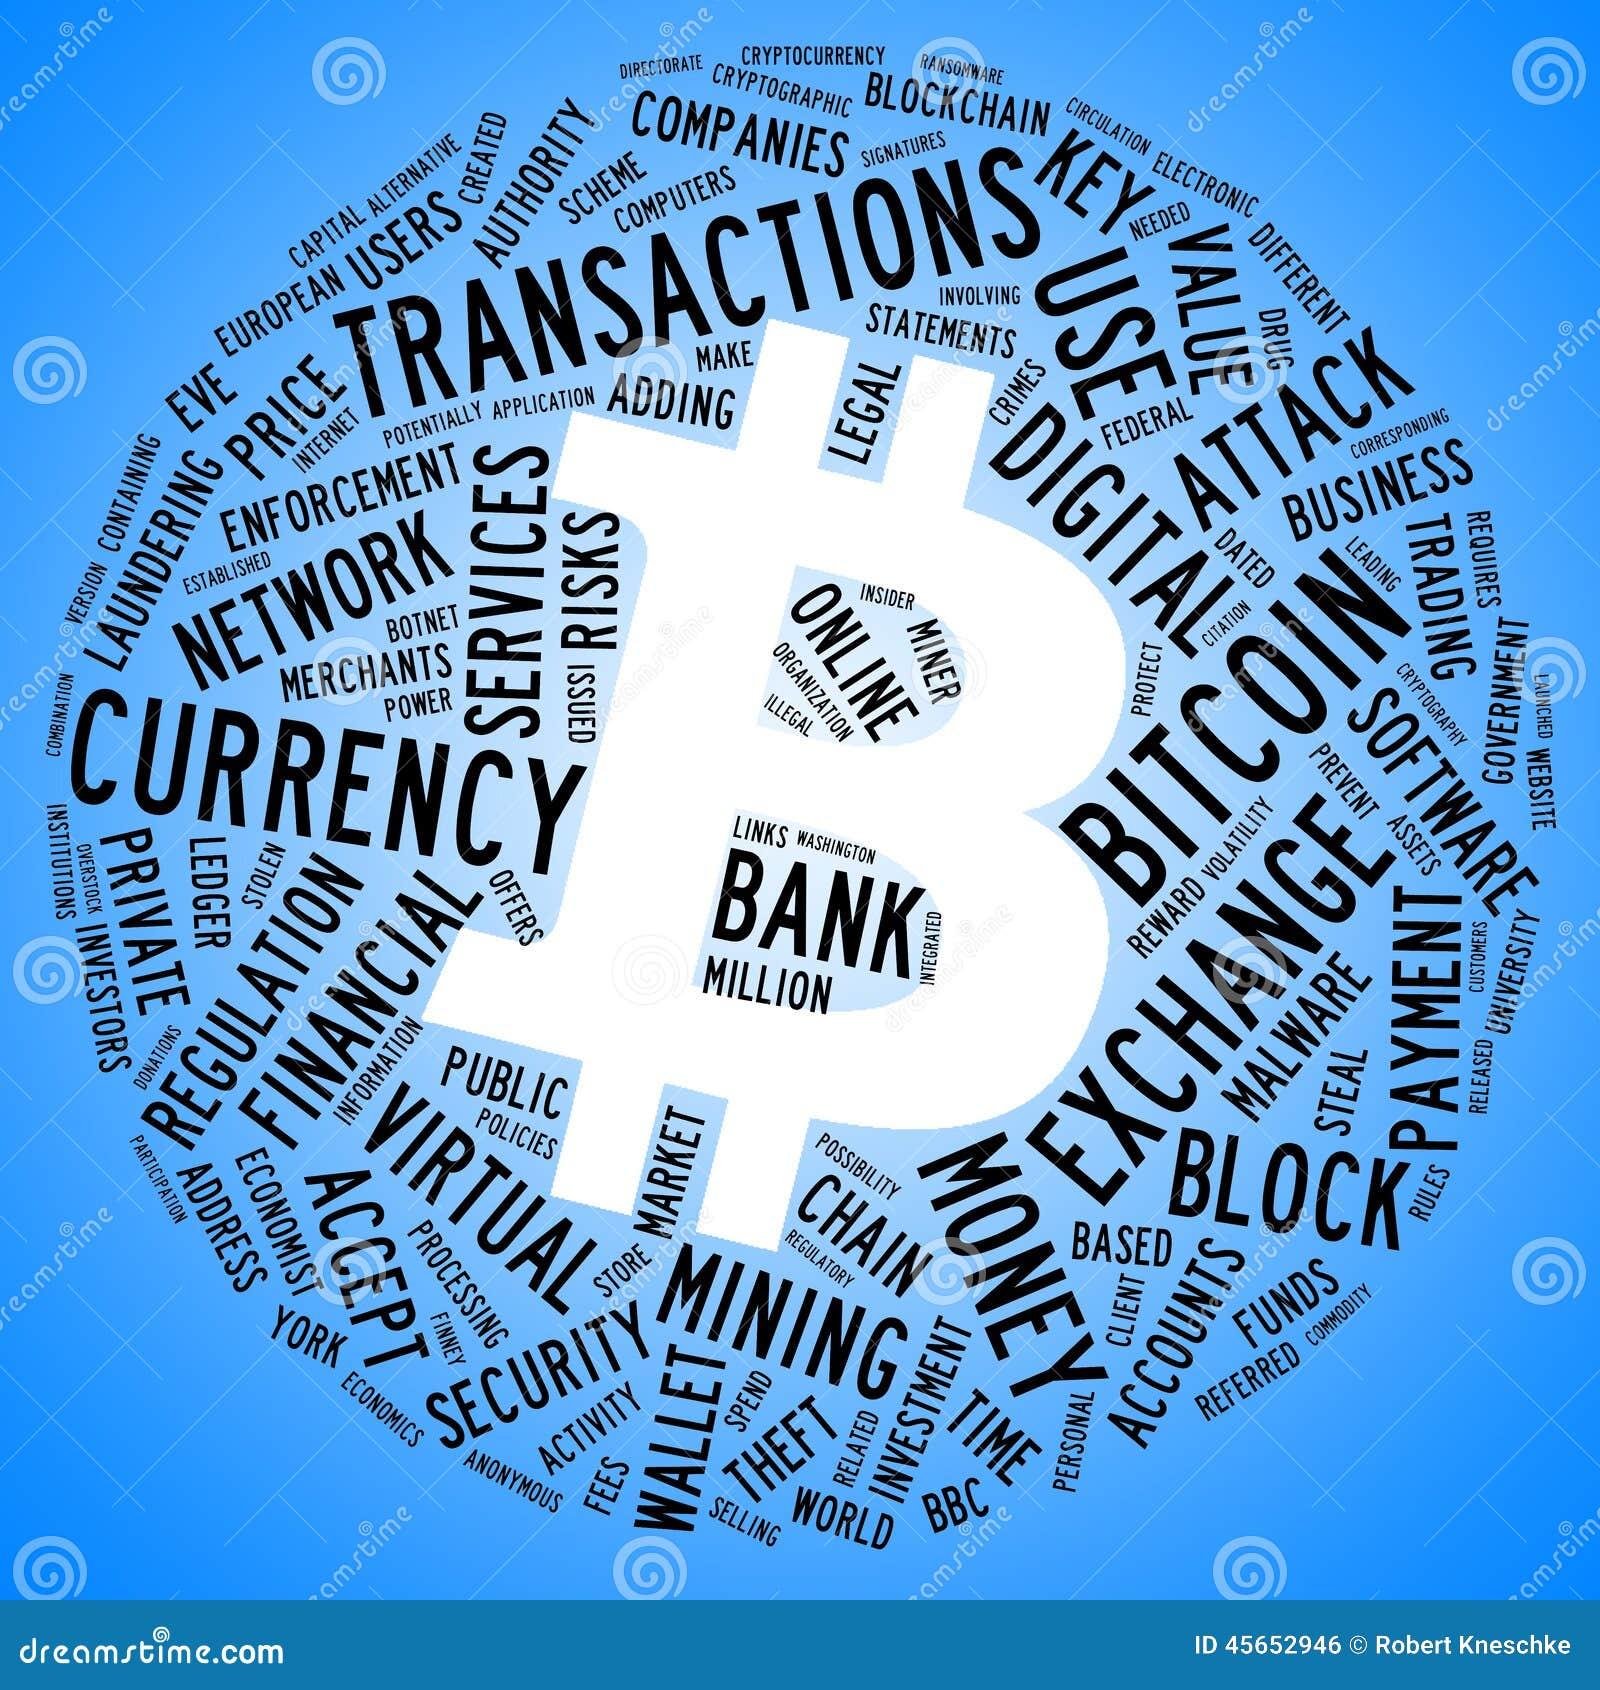 cloud based bitcoin mining